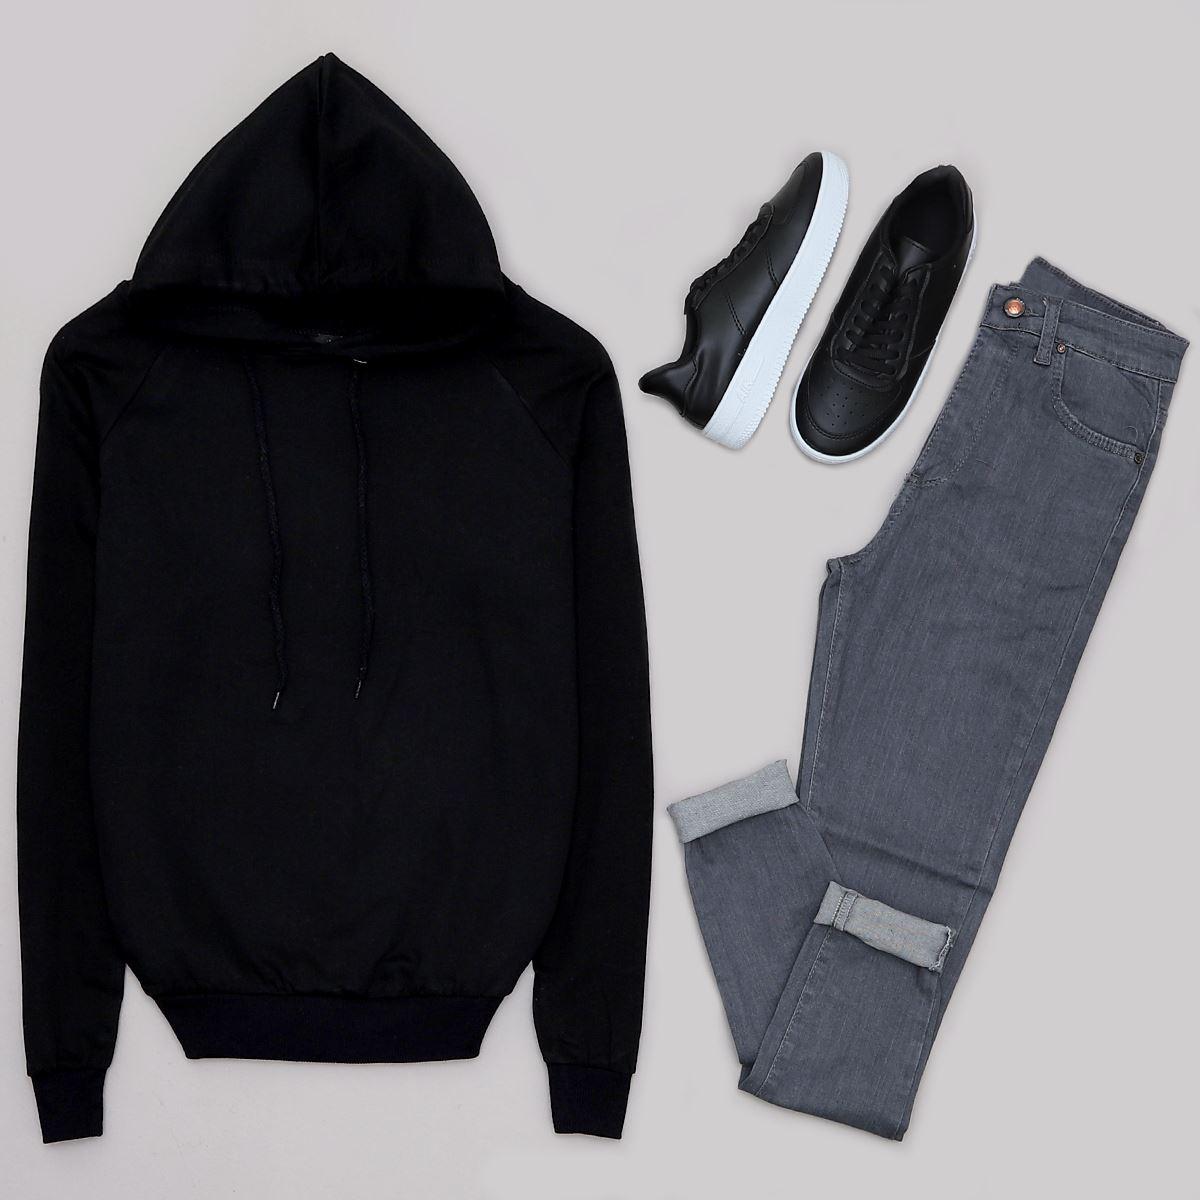 Siyah Kapşonlu Sweat SWT353